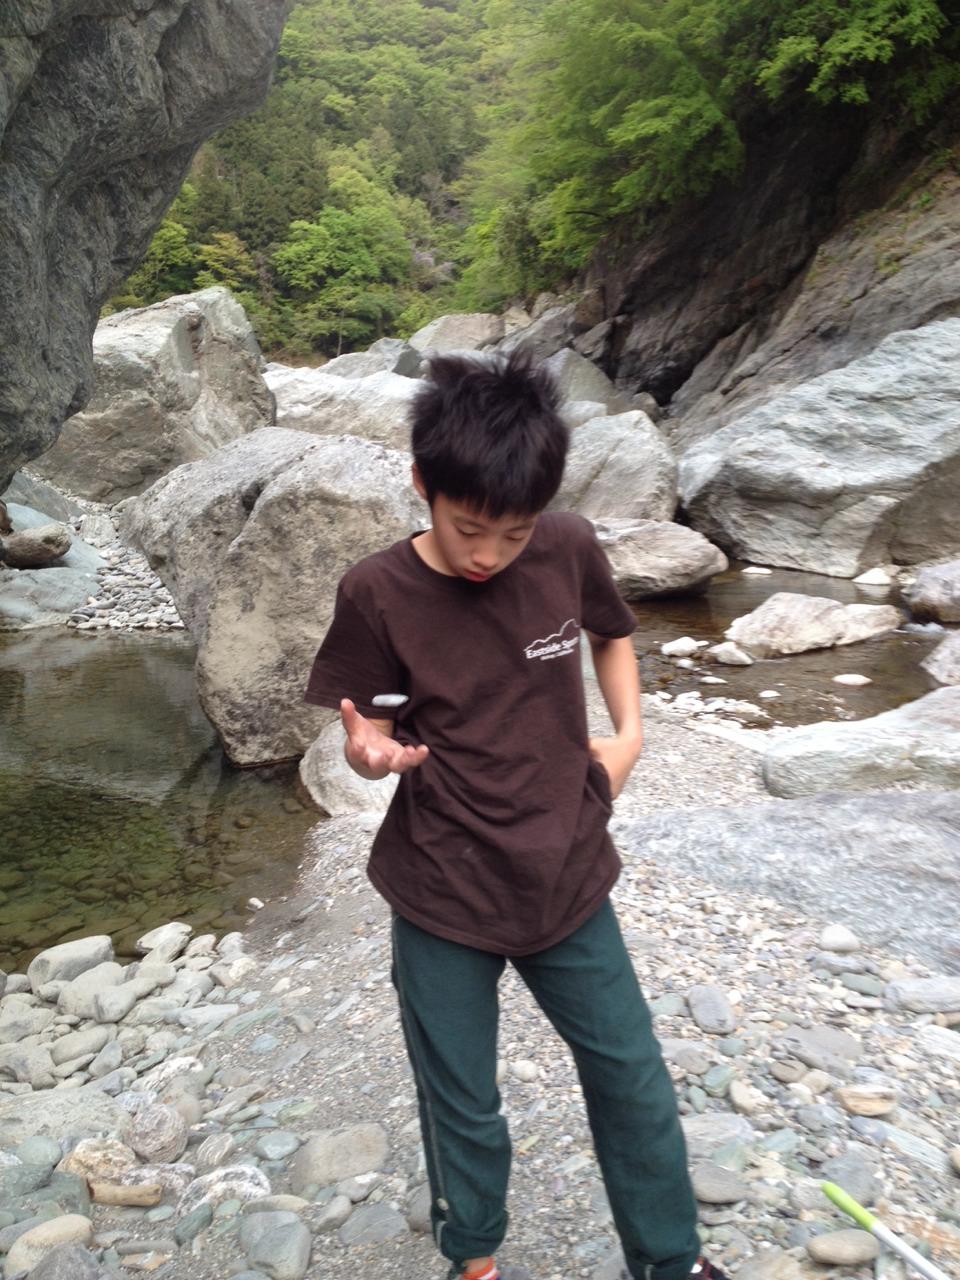 S__7708696.jpg